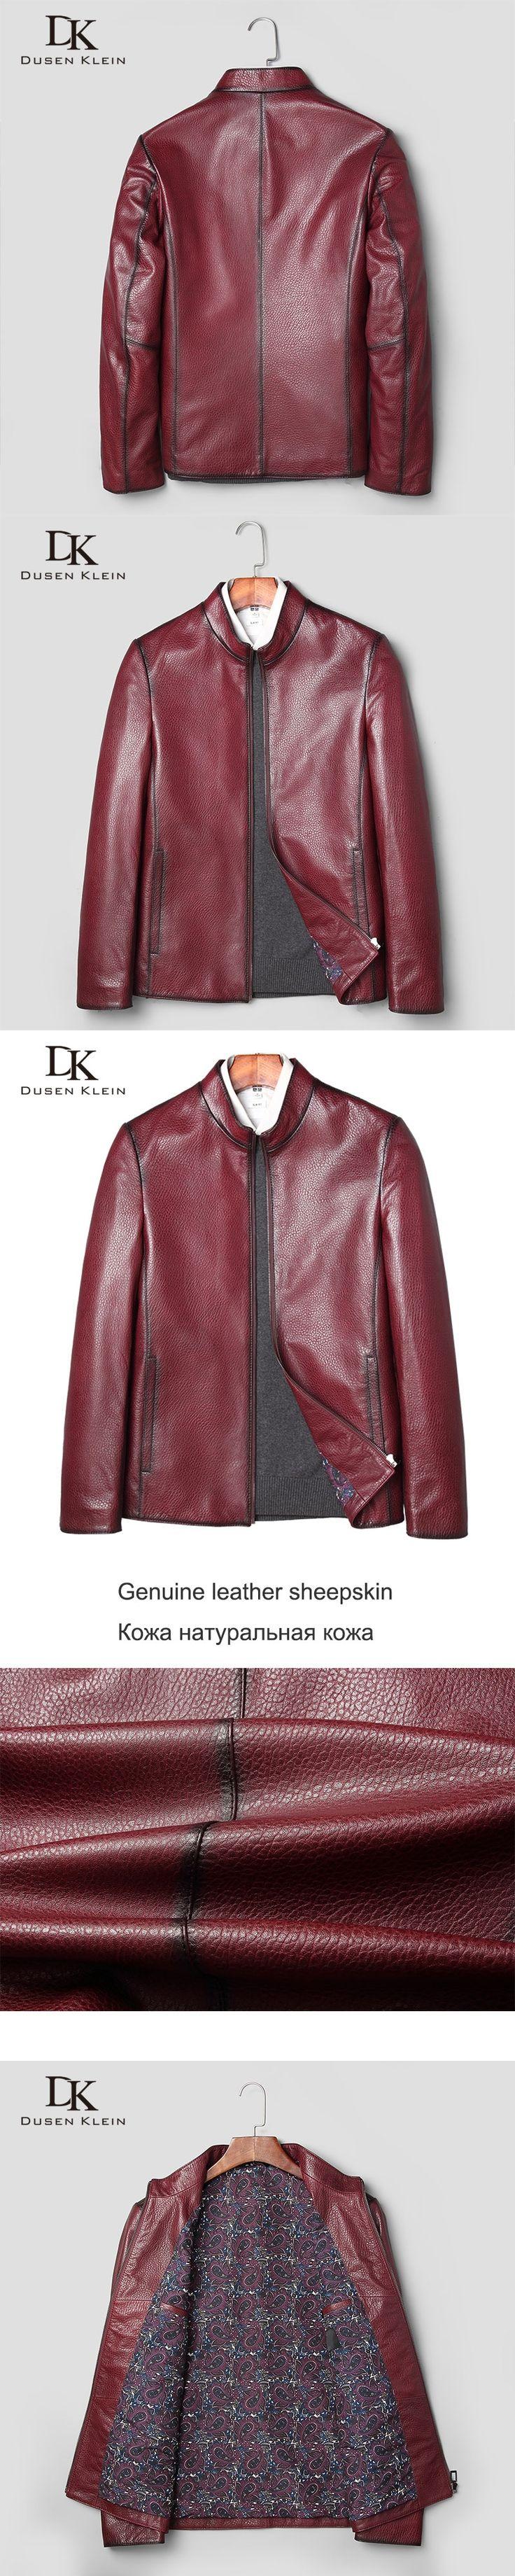 Motorcycle jacket men Fashion designer genuine Sheepskin Jacket Dusen Klein Male Luxury Leather Coat Autumn coats  71J7830N